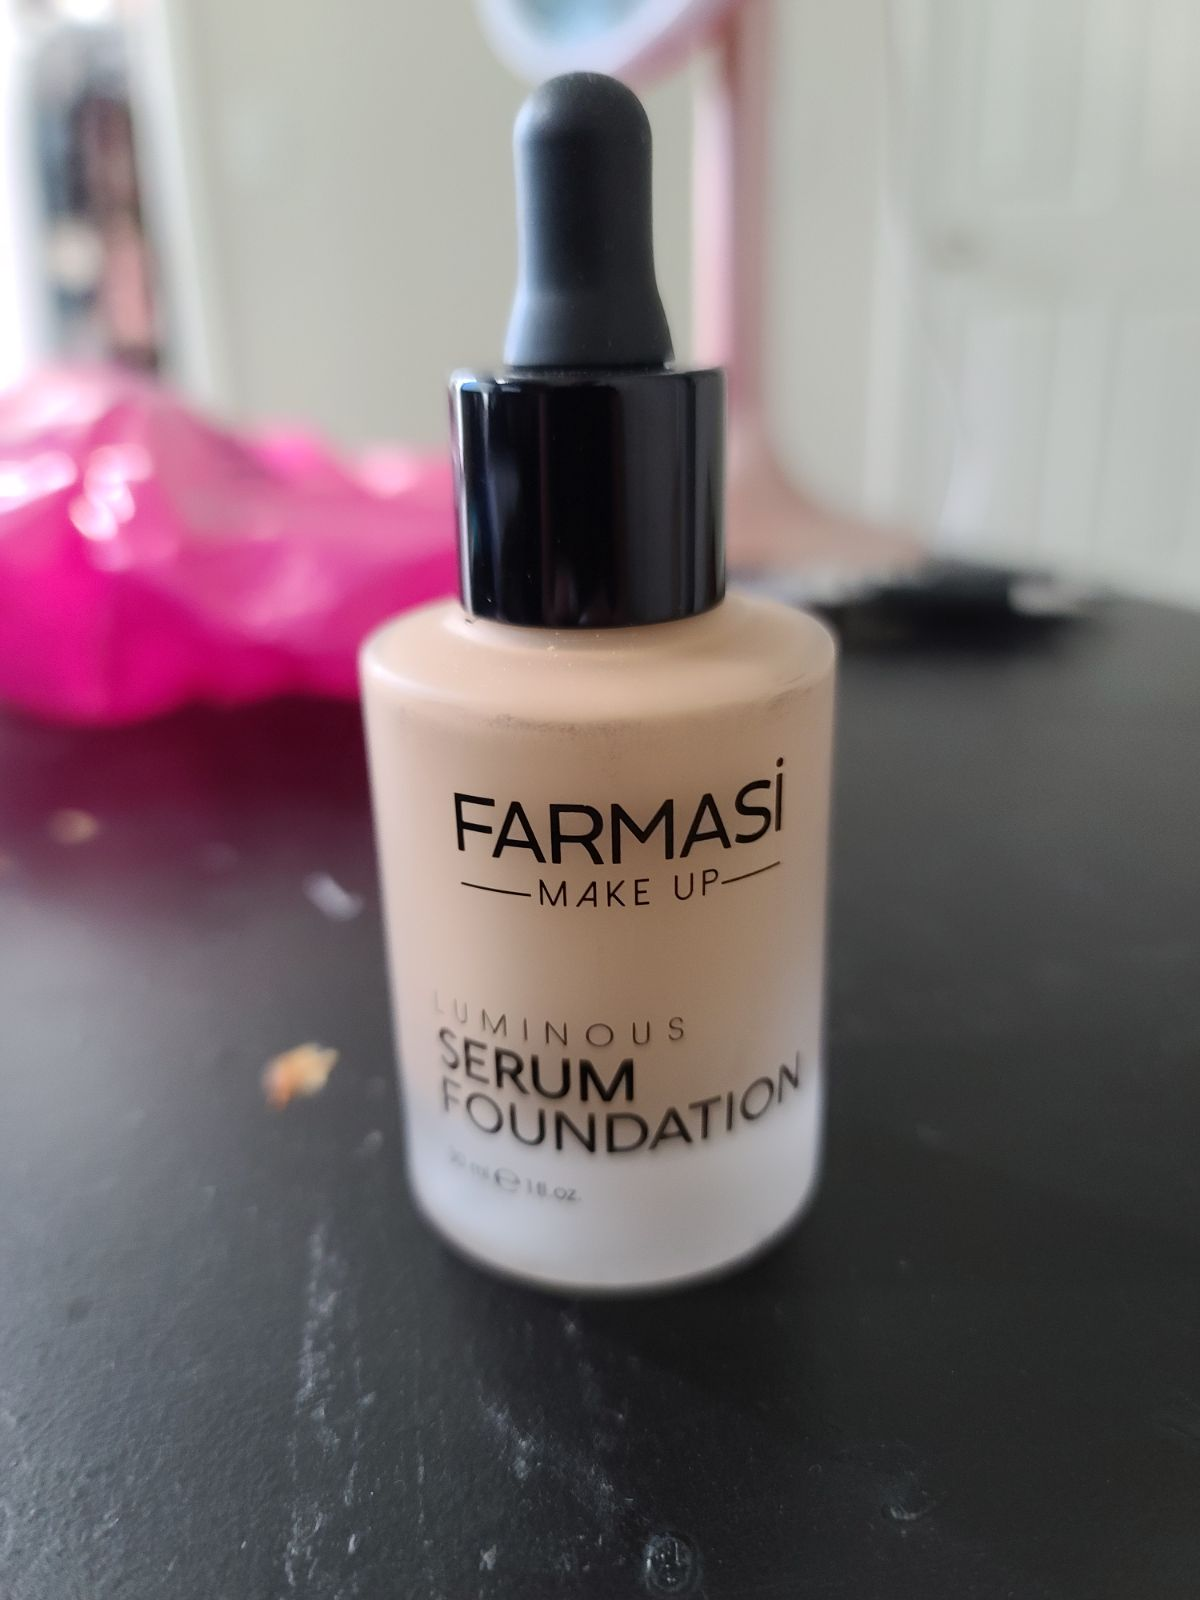 Farmasi Serum Foundation